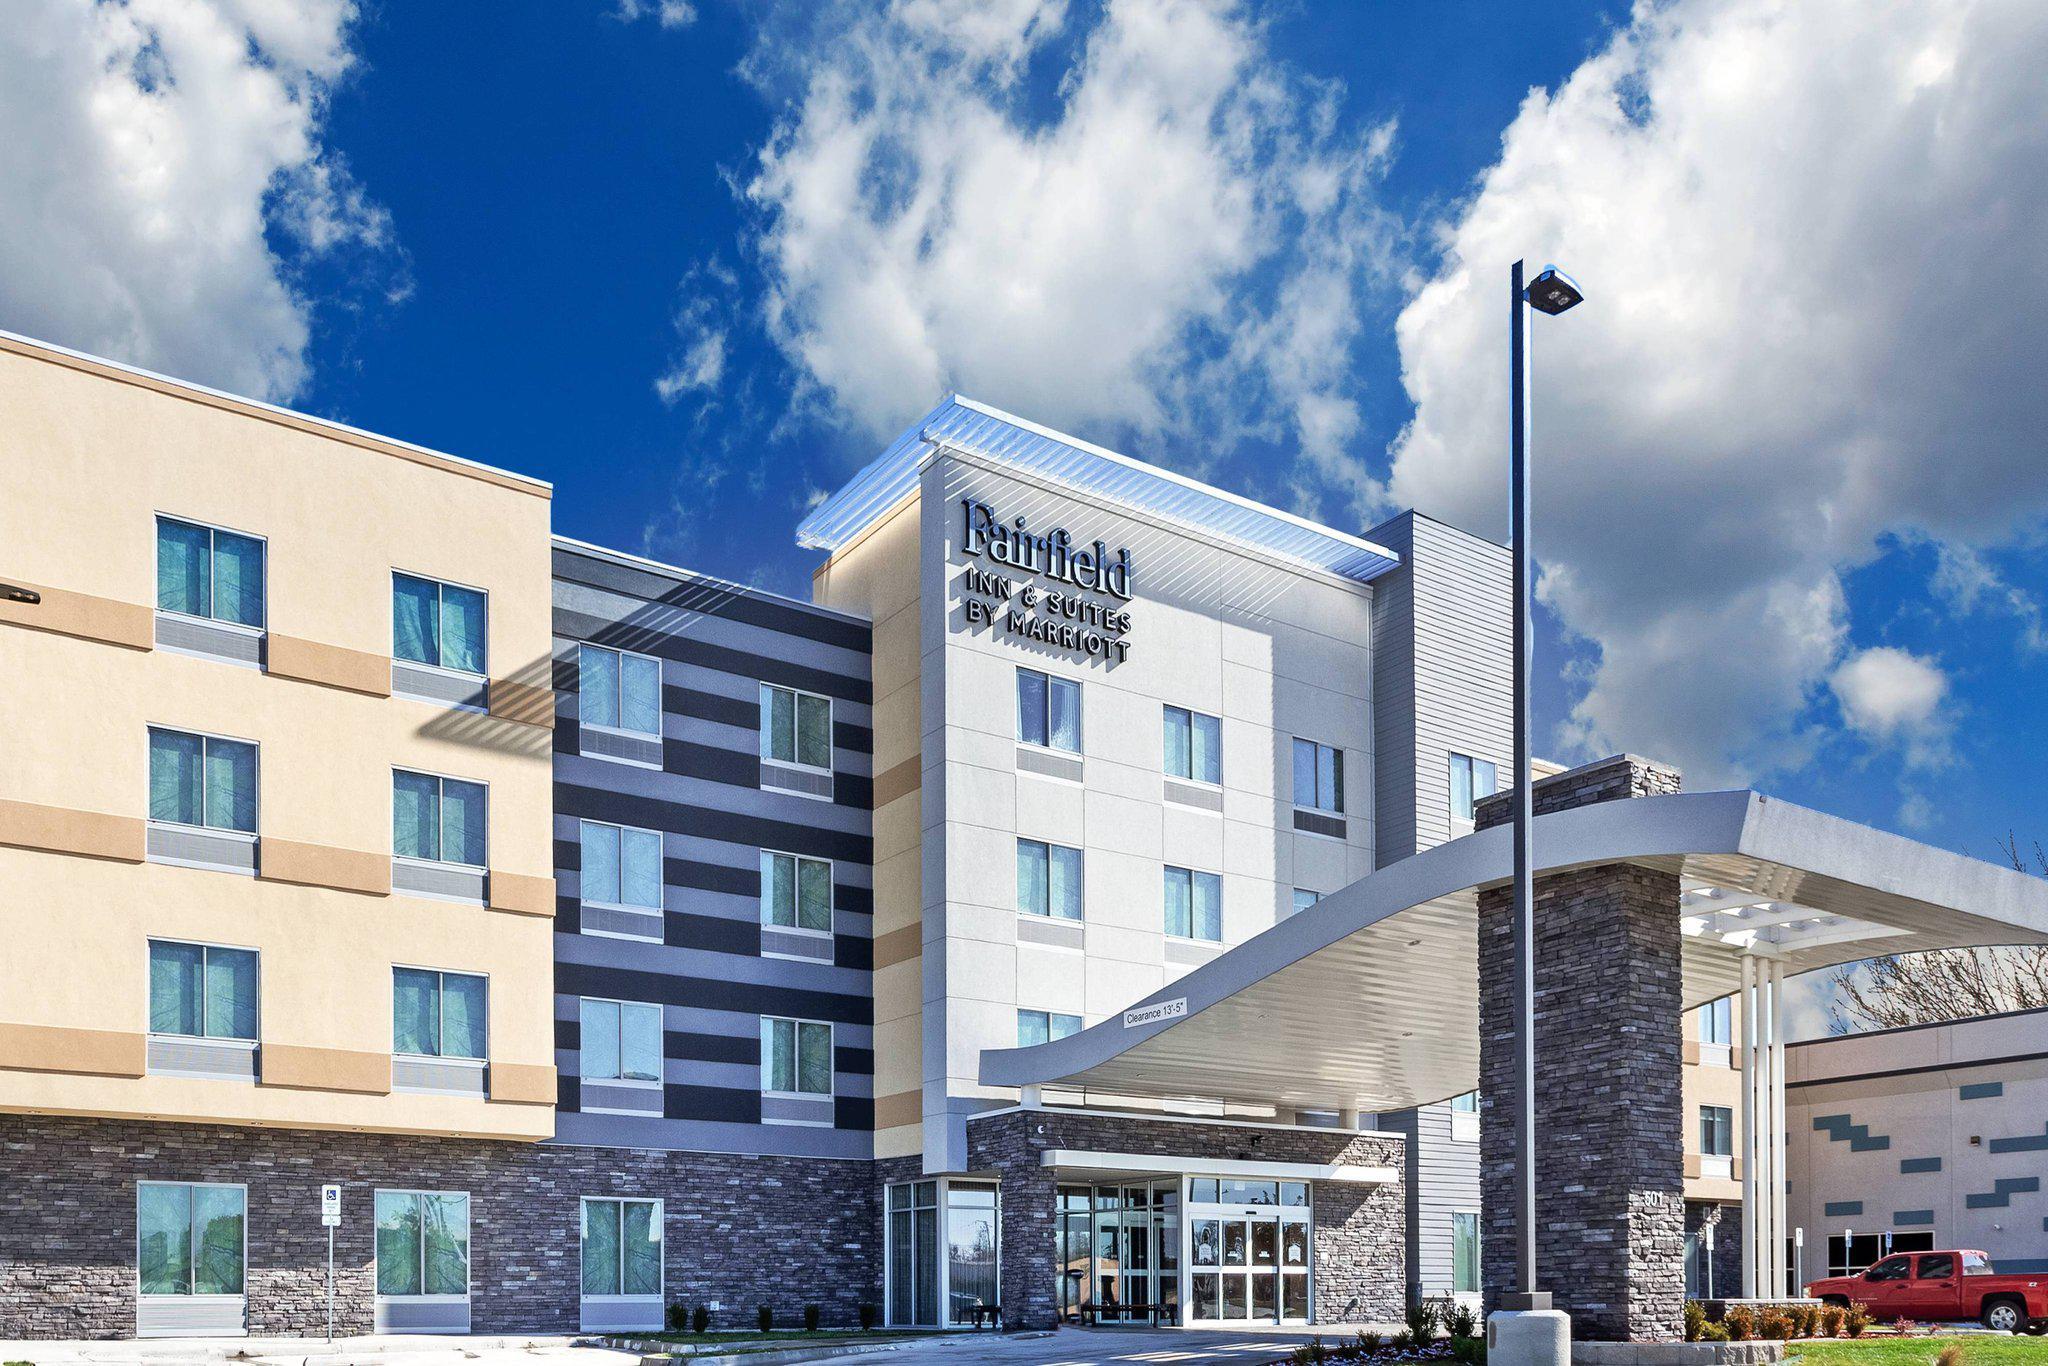 Fairfield Inn & Suites by Marriott Liberal